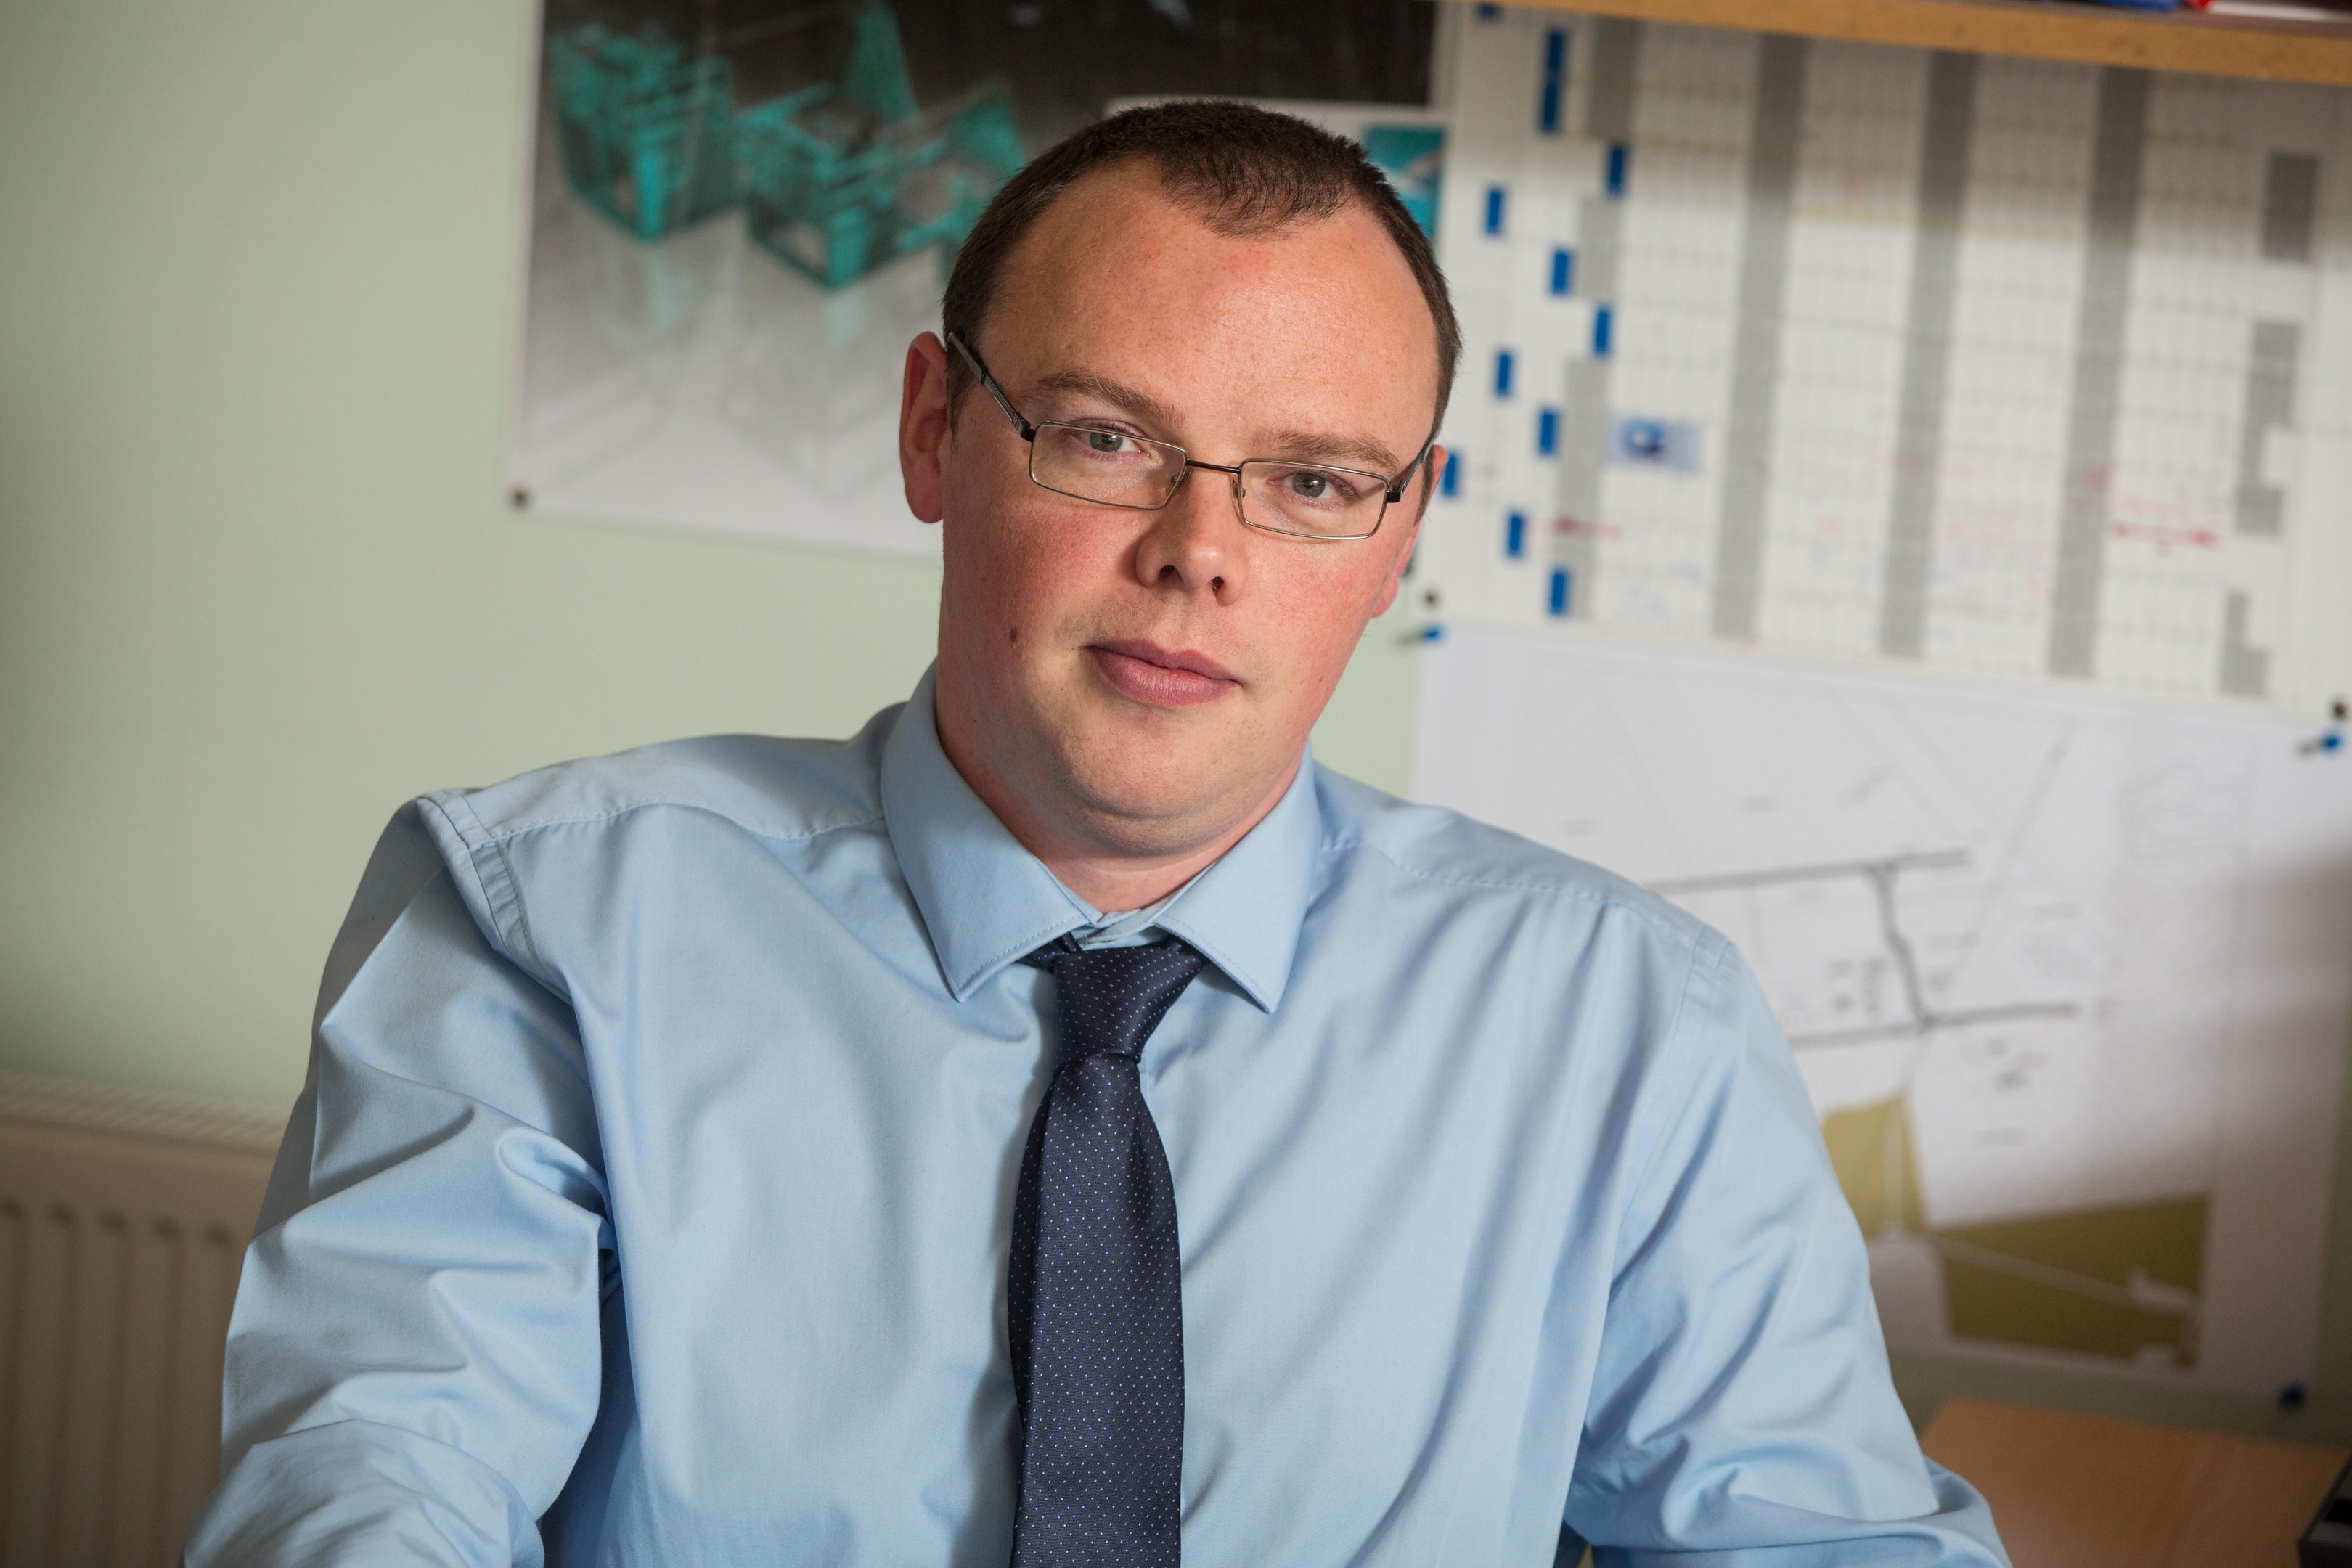 Director of Motive Offshore Group, James Gregg